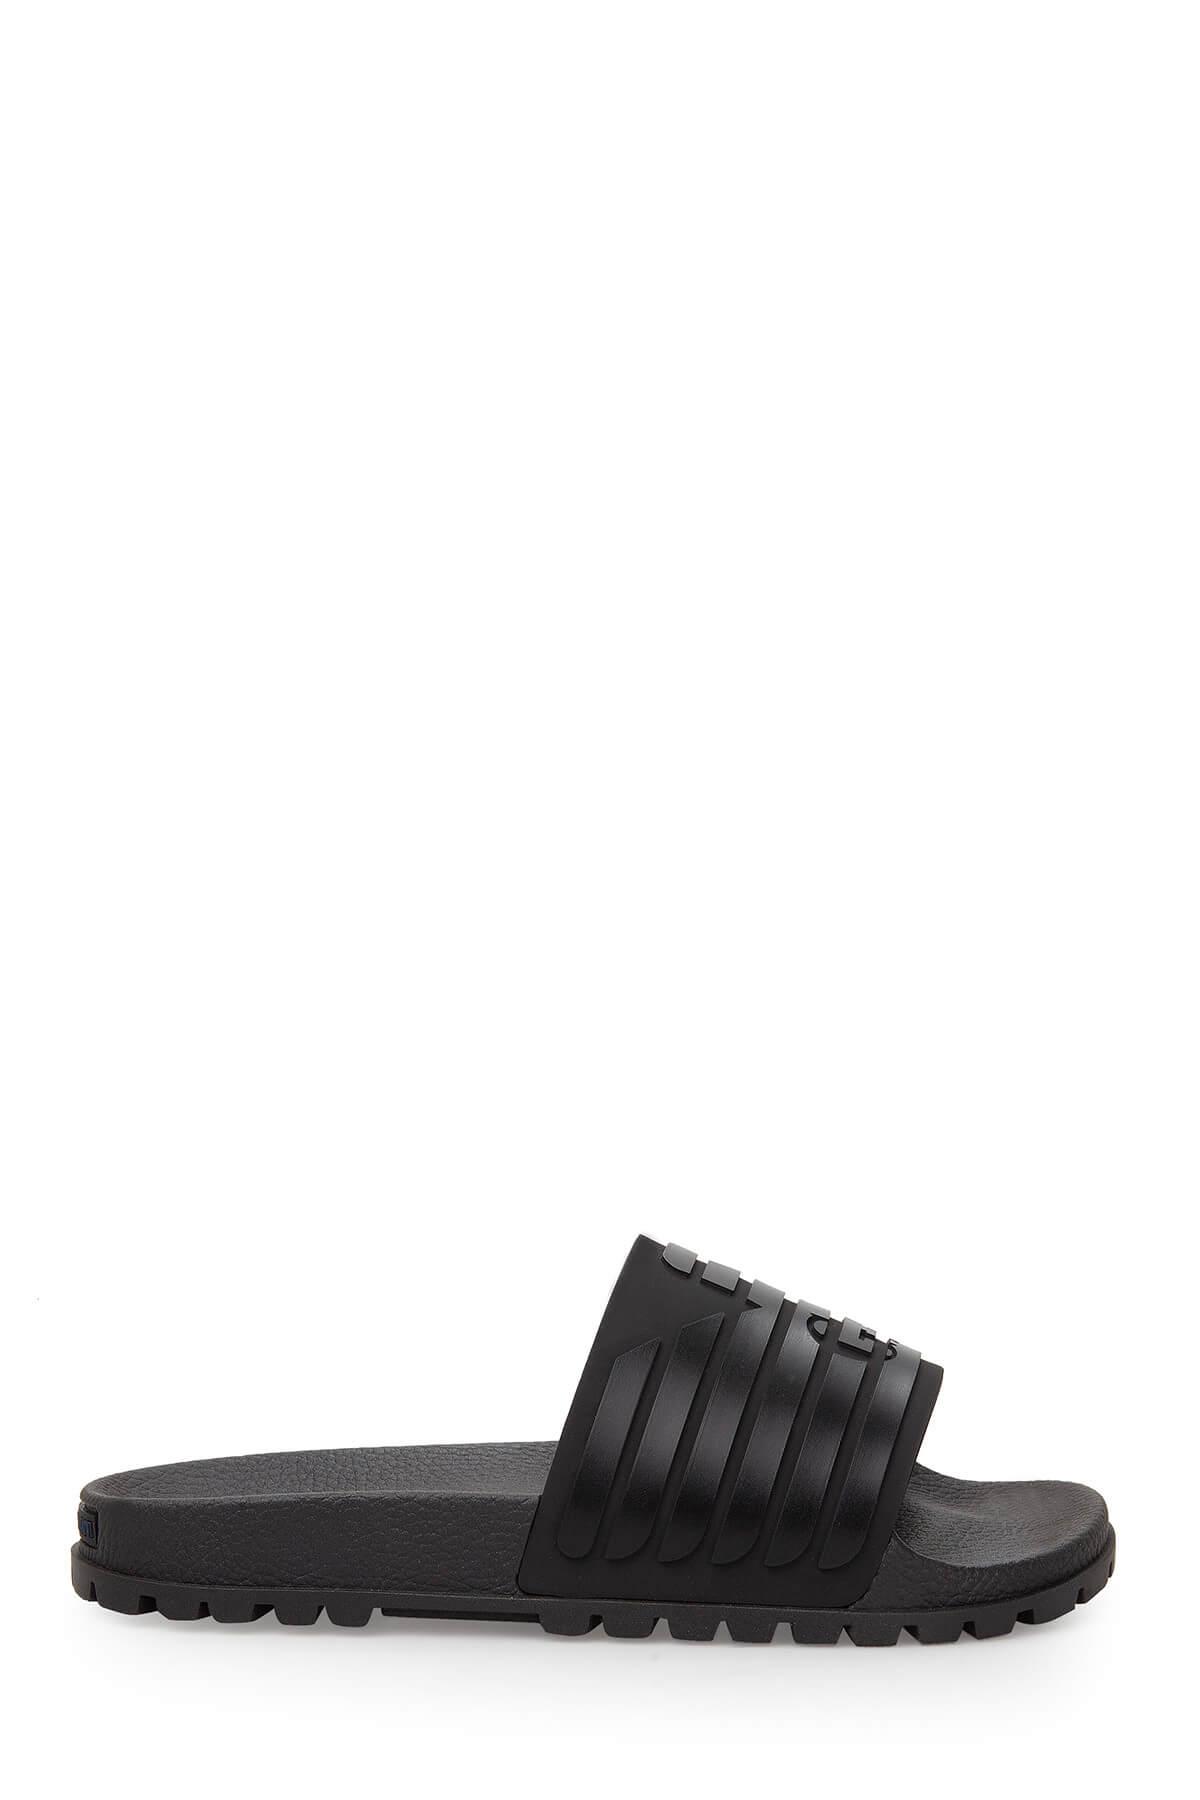 Emporio Armani Siyah Erkek Terlik X4P077 Xl273 A039 2